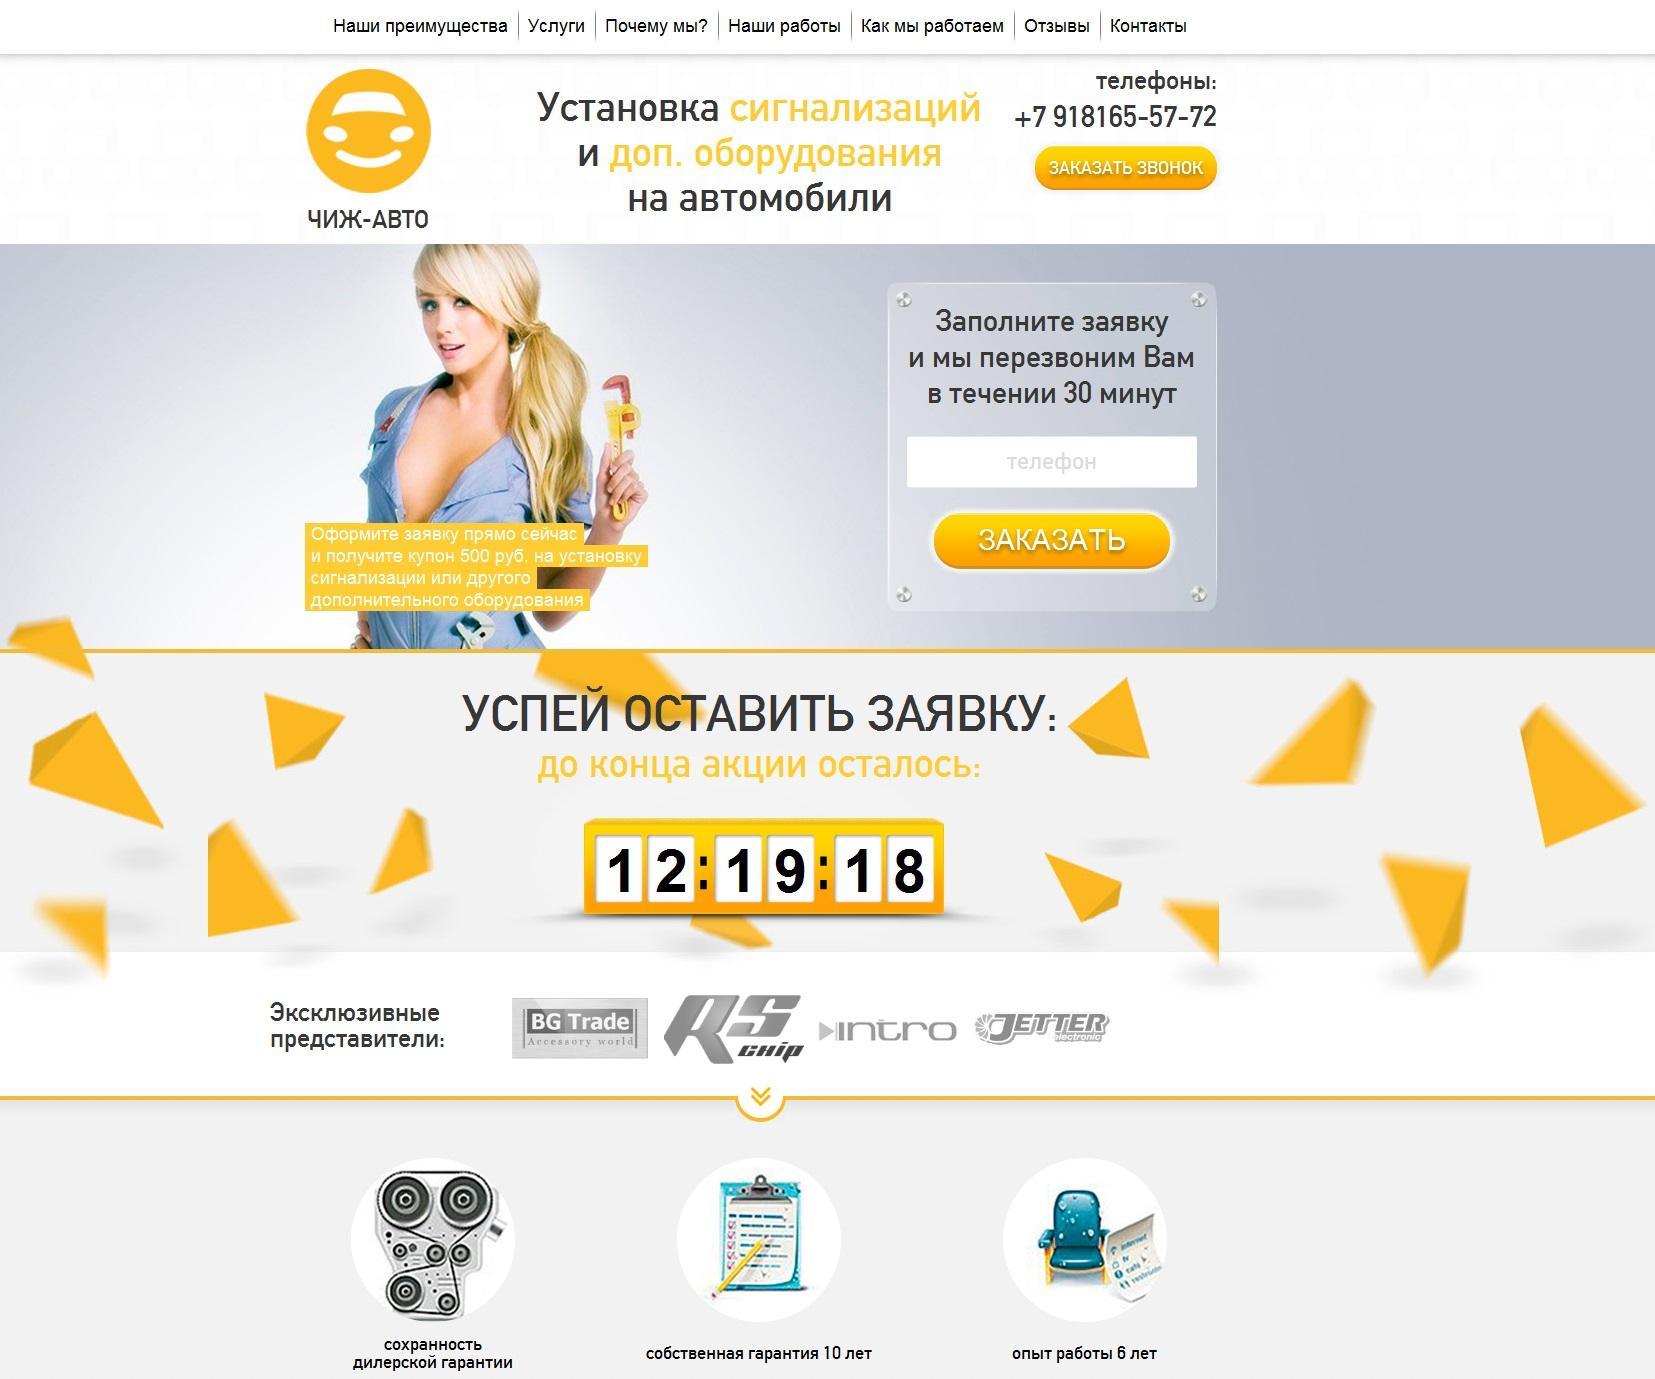 Сайты с частными фотографиями 27 фотография